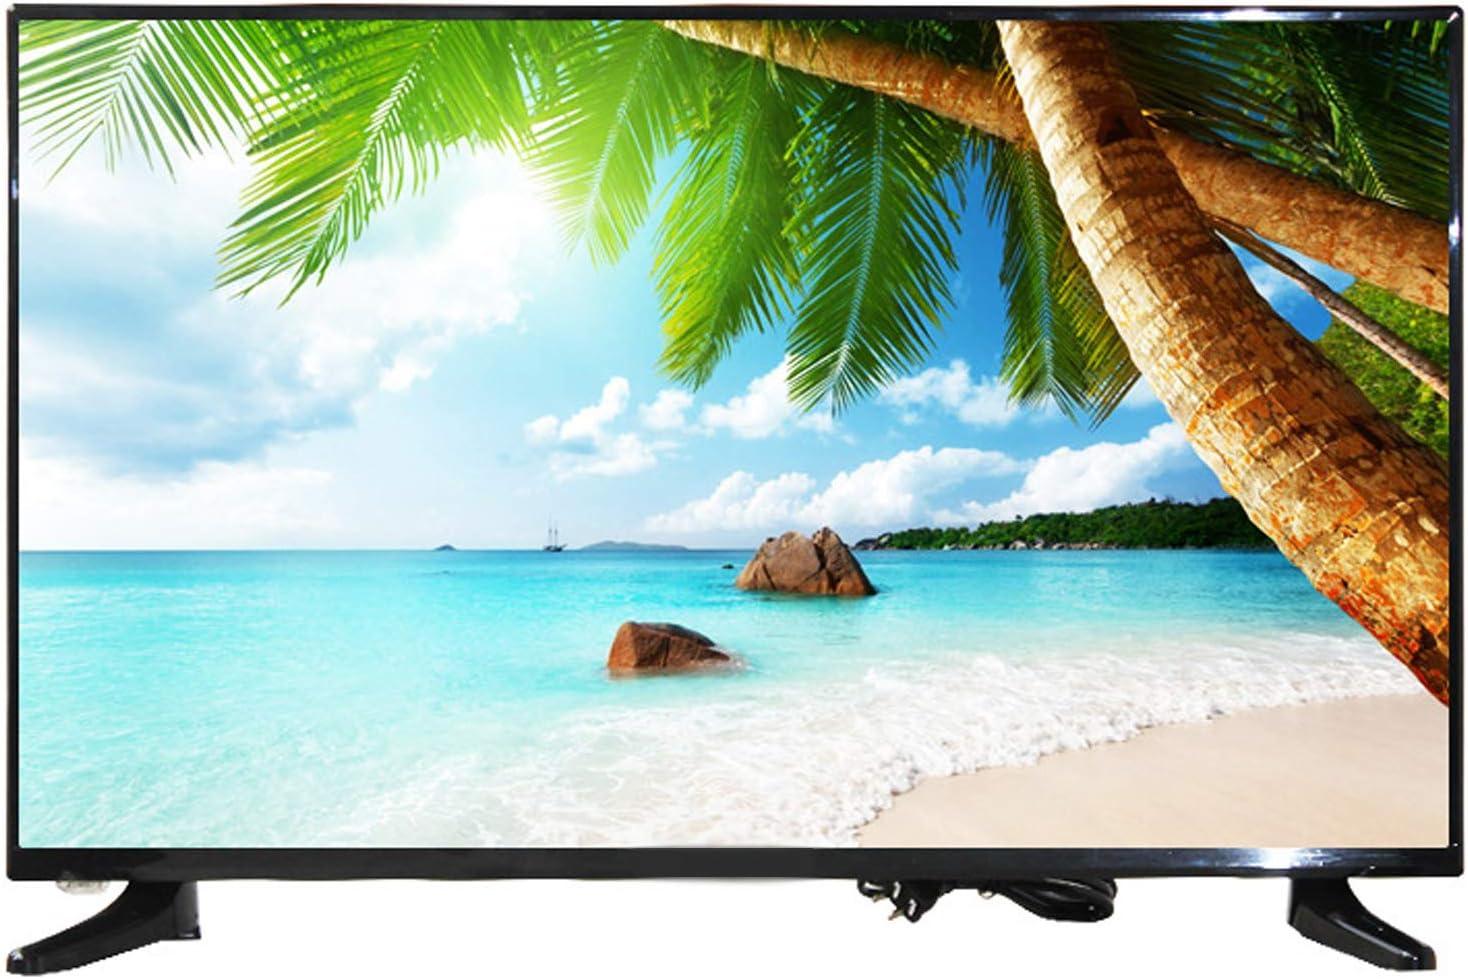 XZZ 32-inch 42-inch 46-inch Ranking TOP15 HD LCD 4K Smart TV Flat-Screen Japan's largest assortment Tele